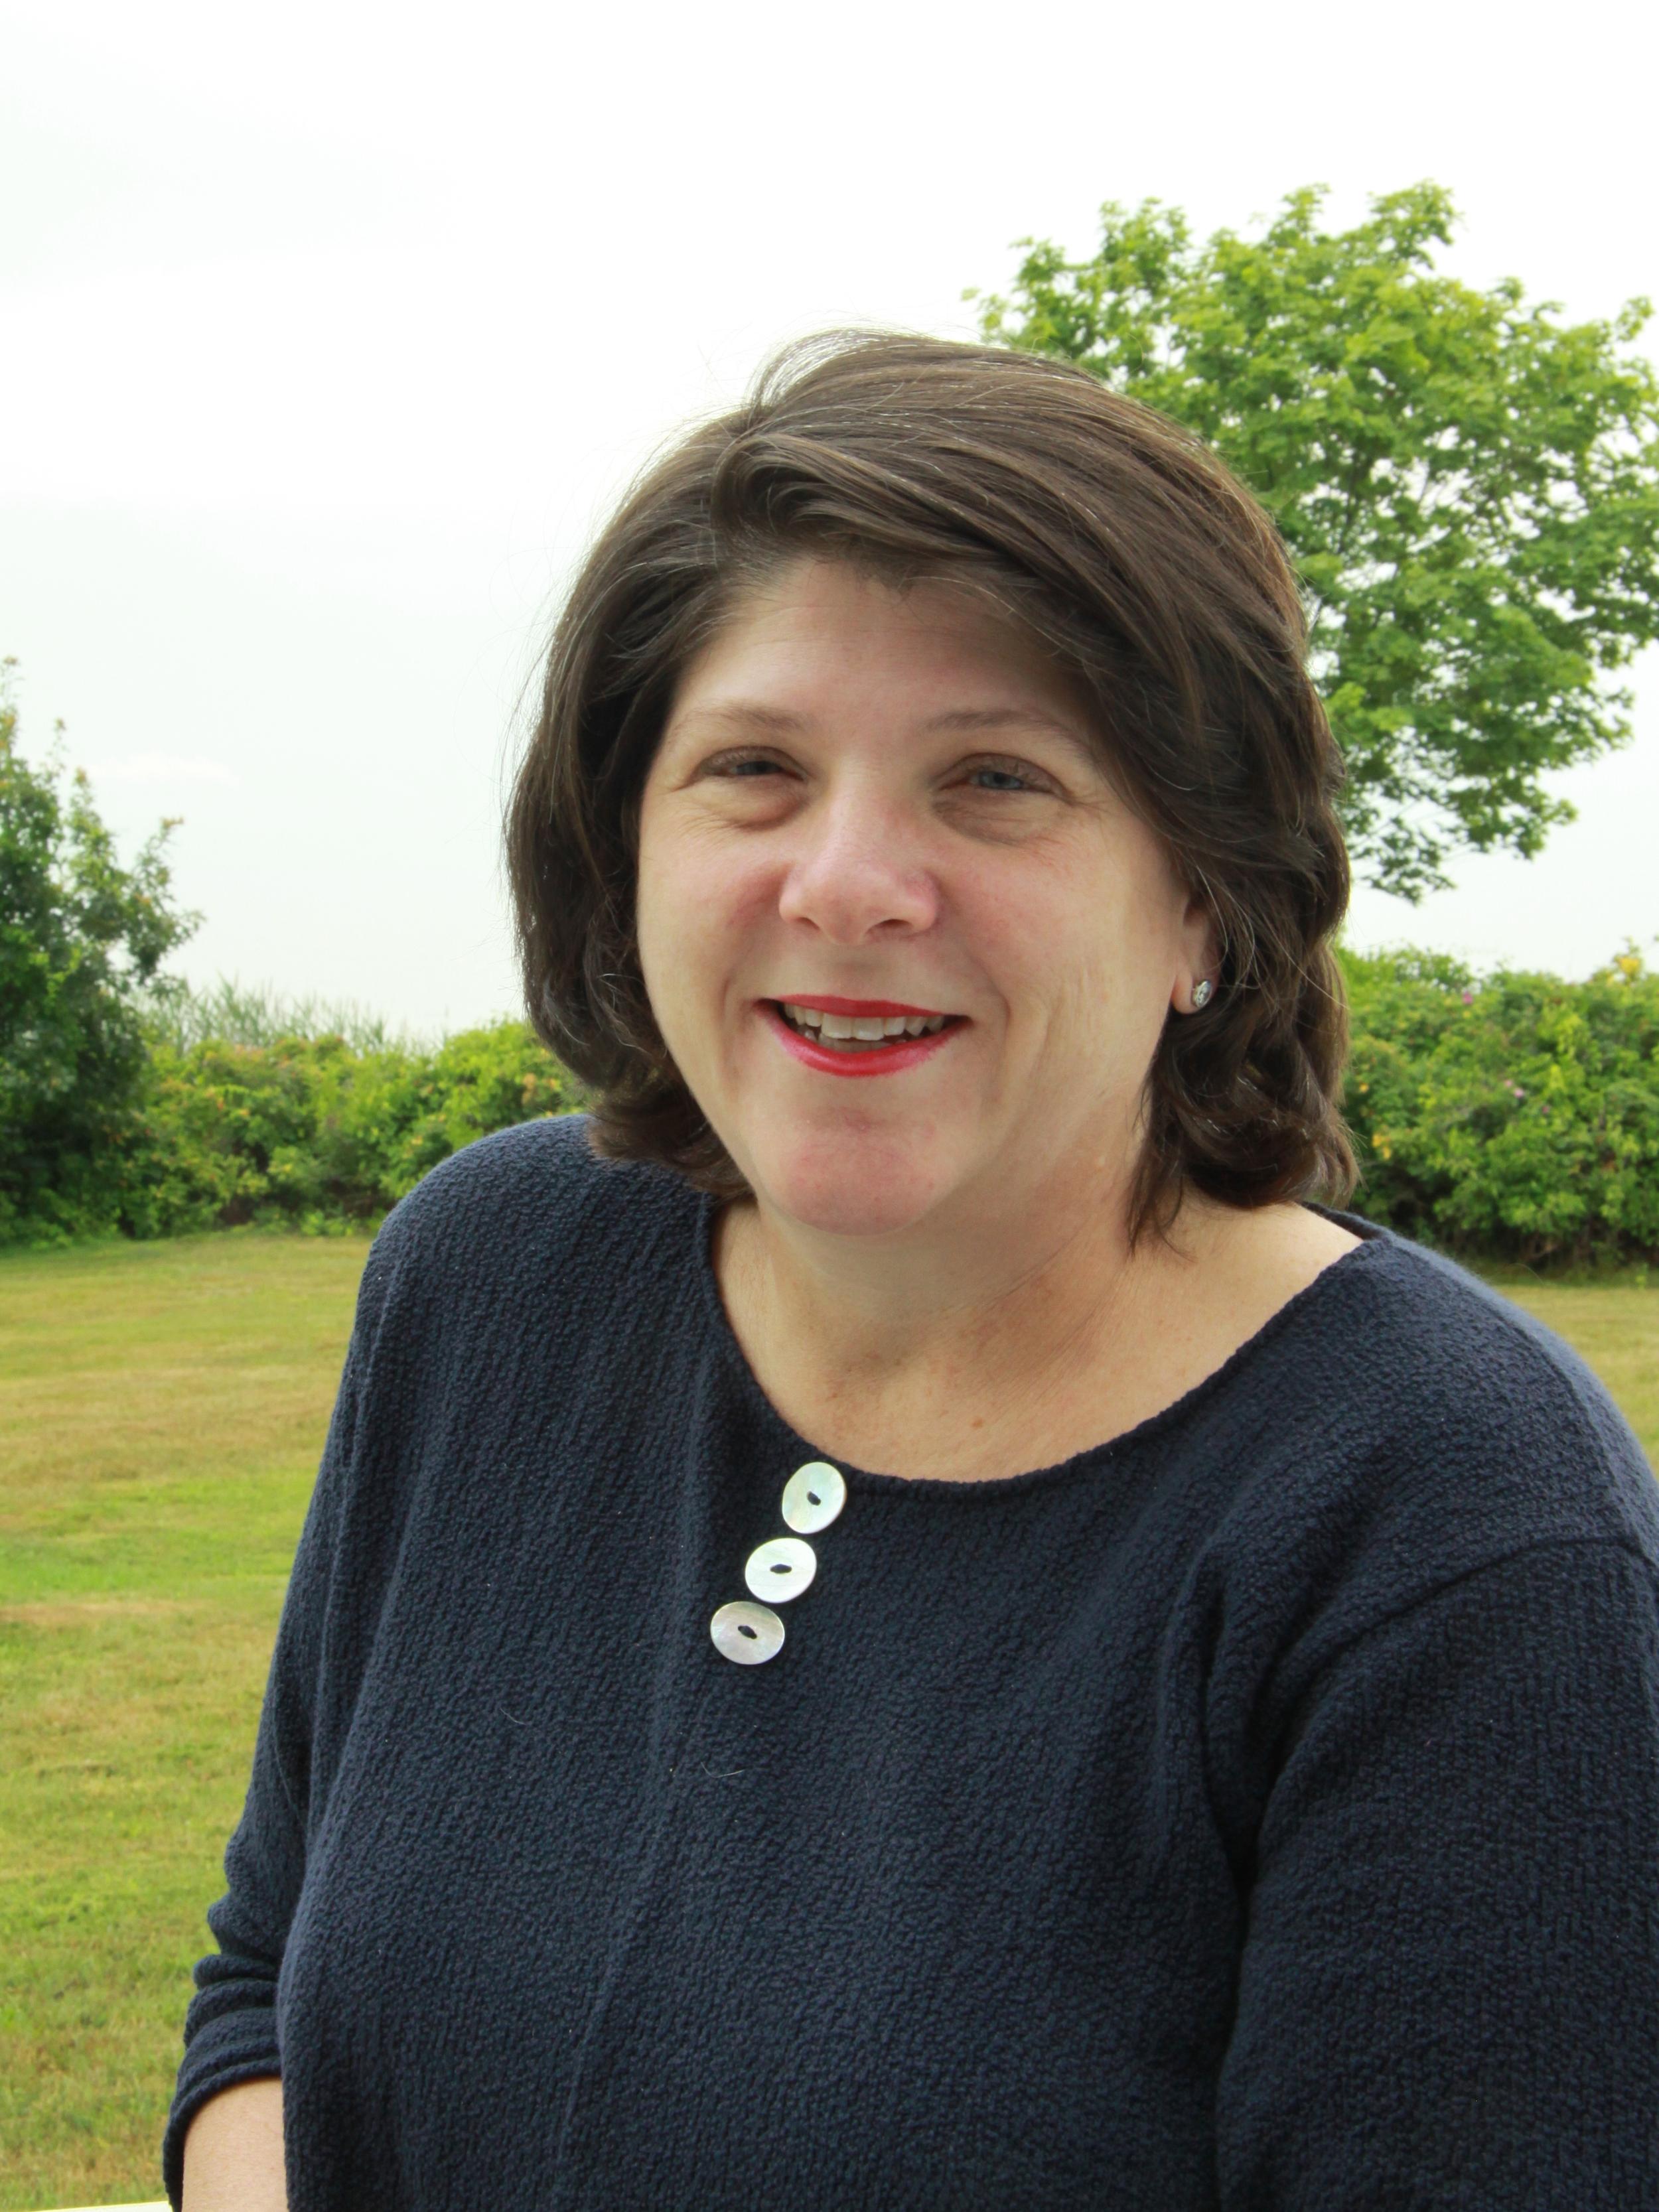 Emily Sandberg, Director of Administration